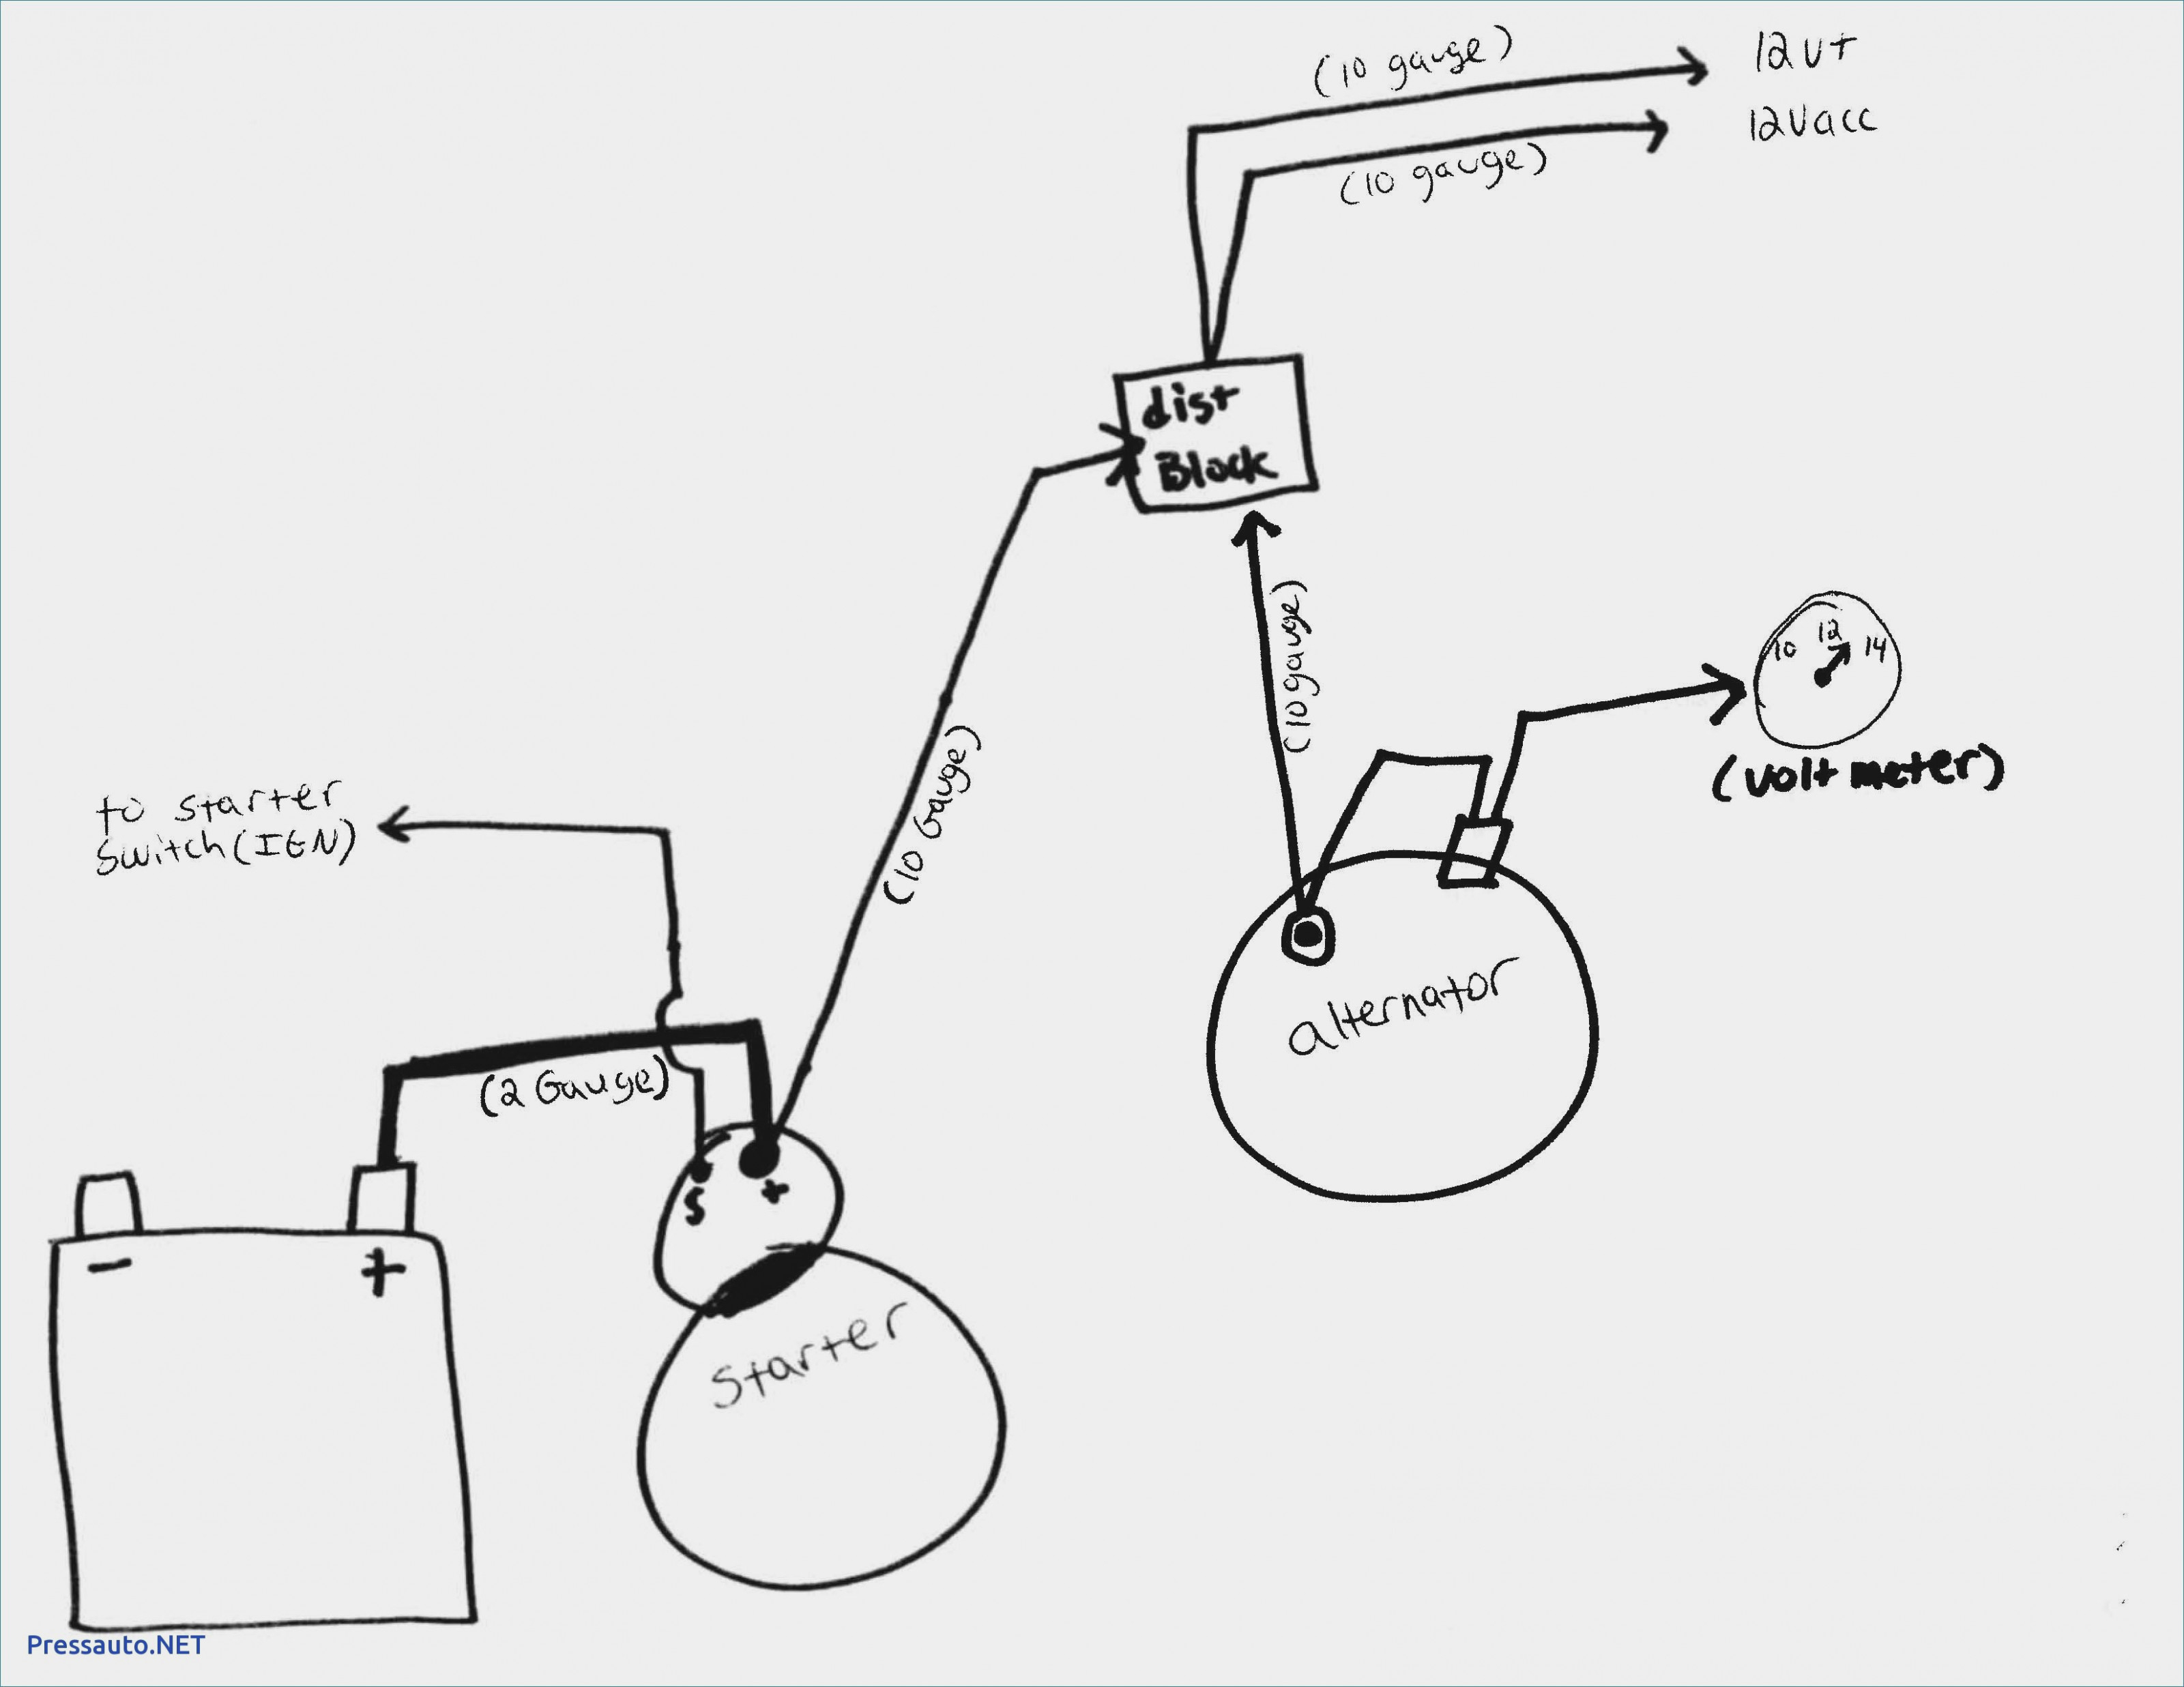 One Wire Diagram | Wiring Diagram - Gm Alternator Wiring Diagram